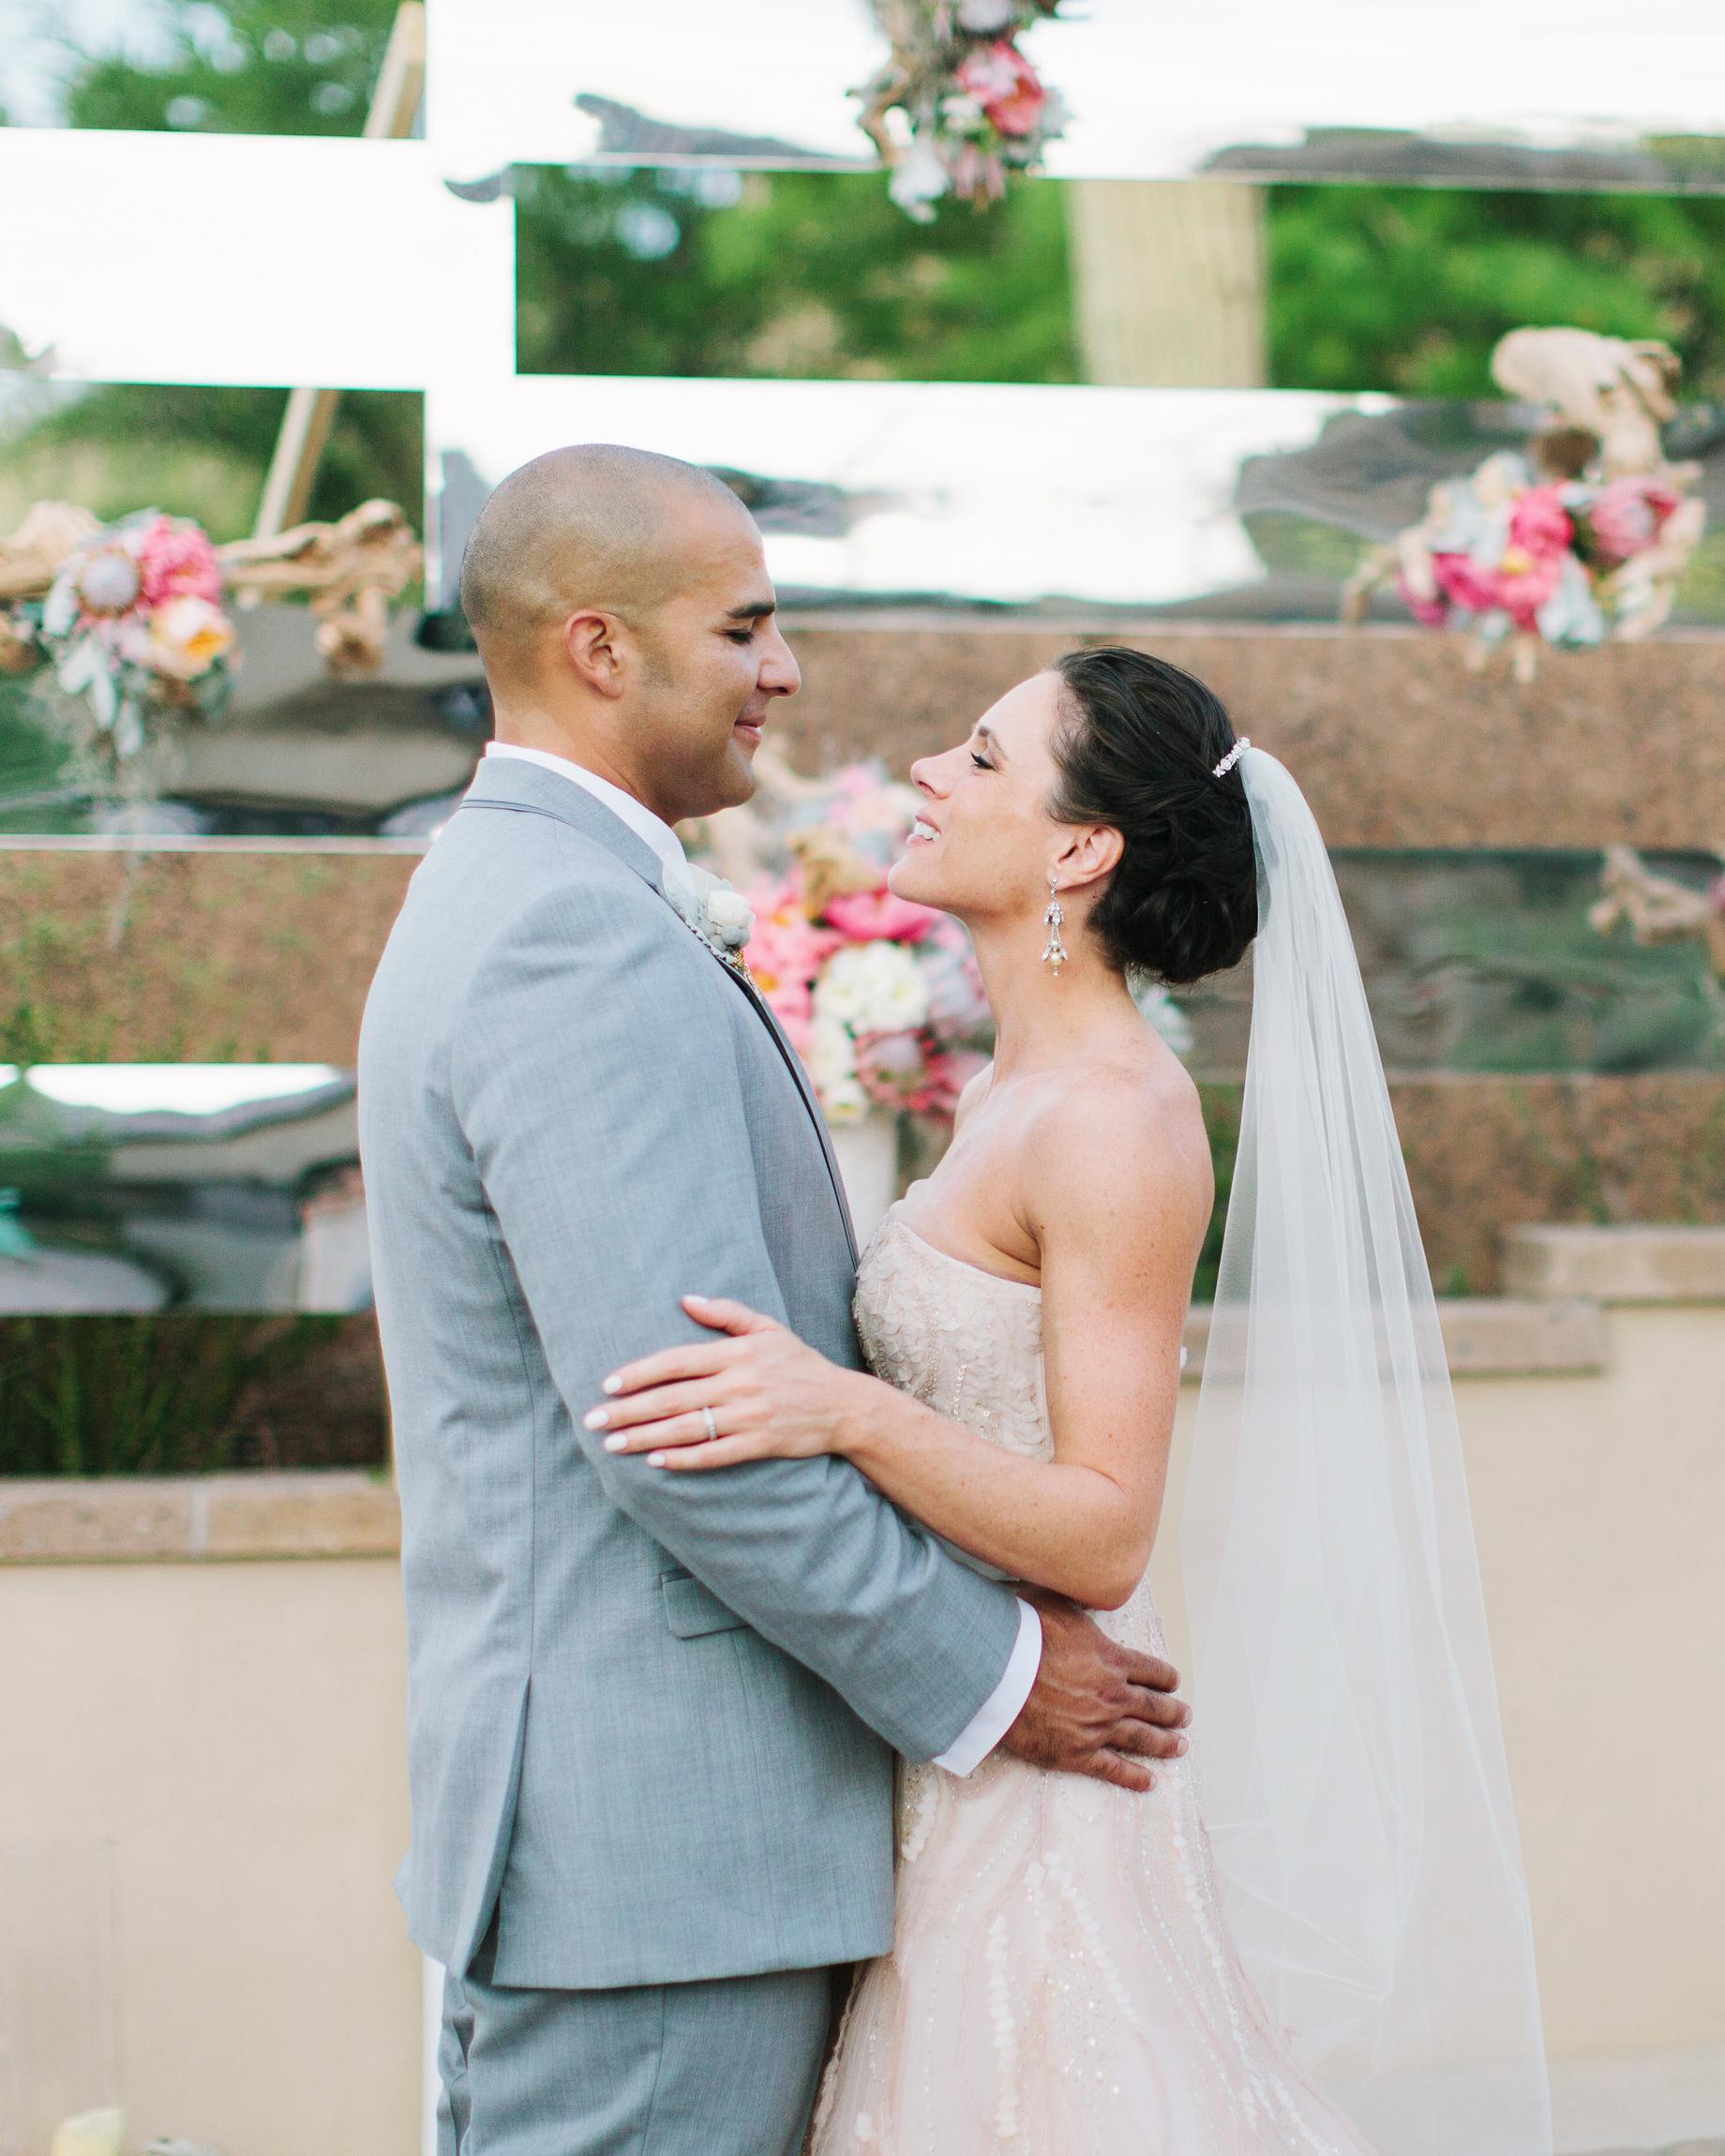 kari-charlie-wedding-couple5-0314.jpg